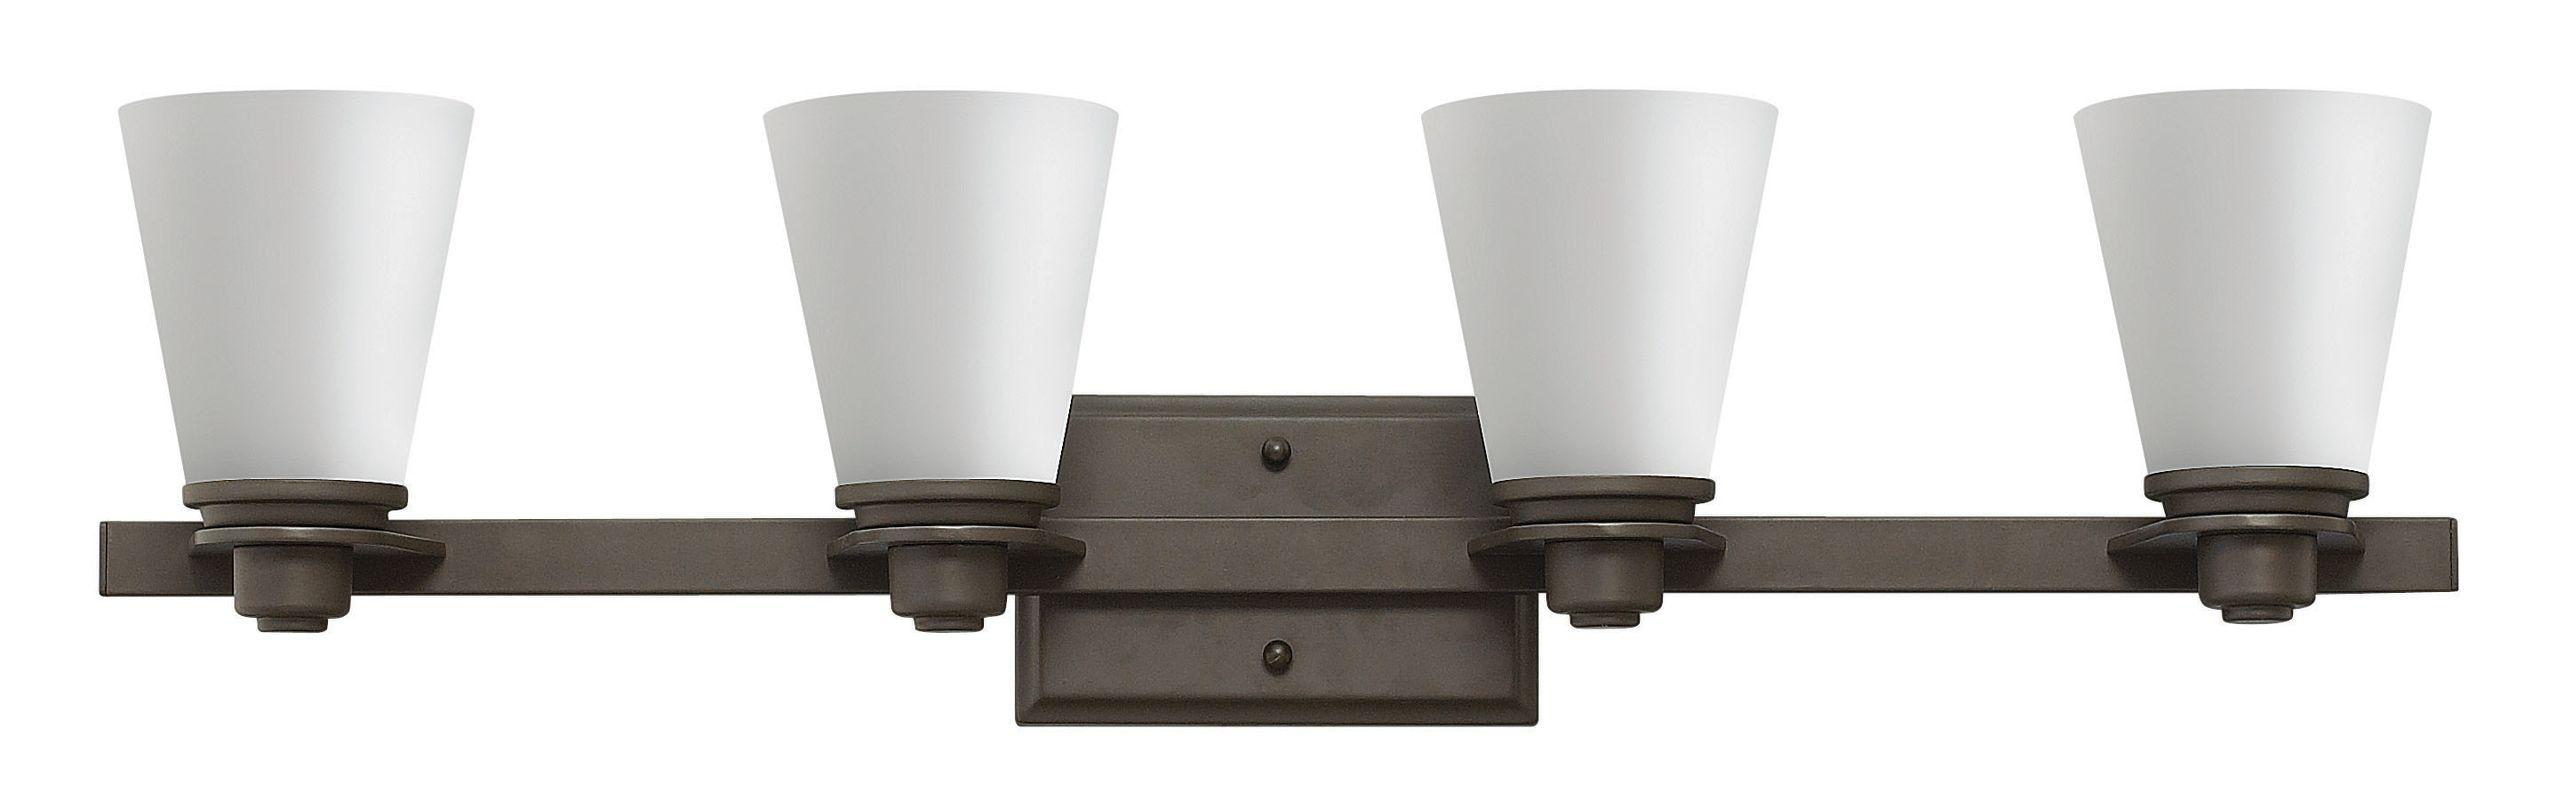 Hinkley Lighting 5554-GU24 4 Light Title 24 Fluorescent Bathroom